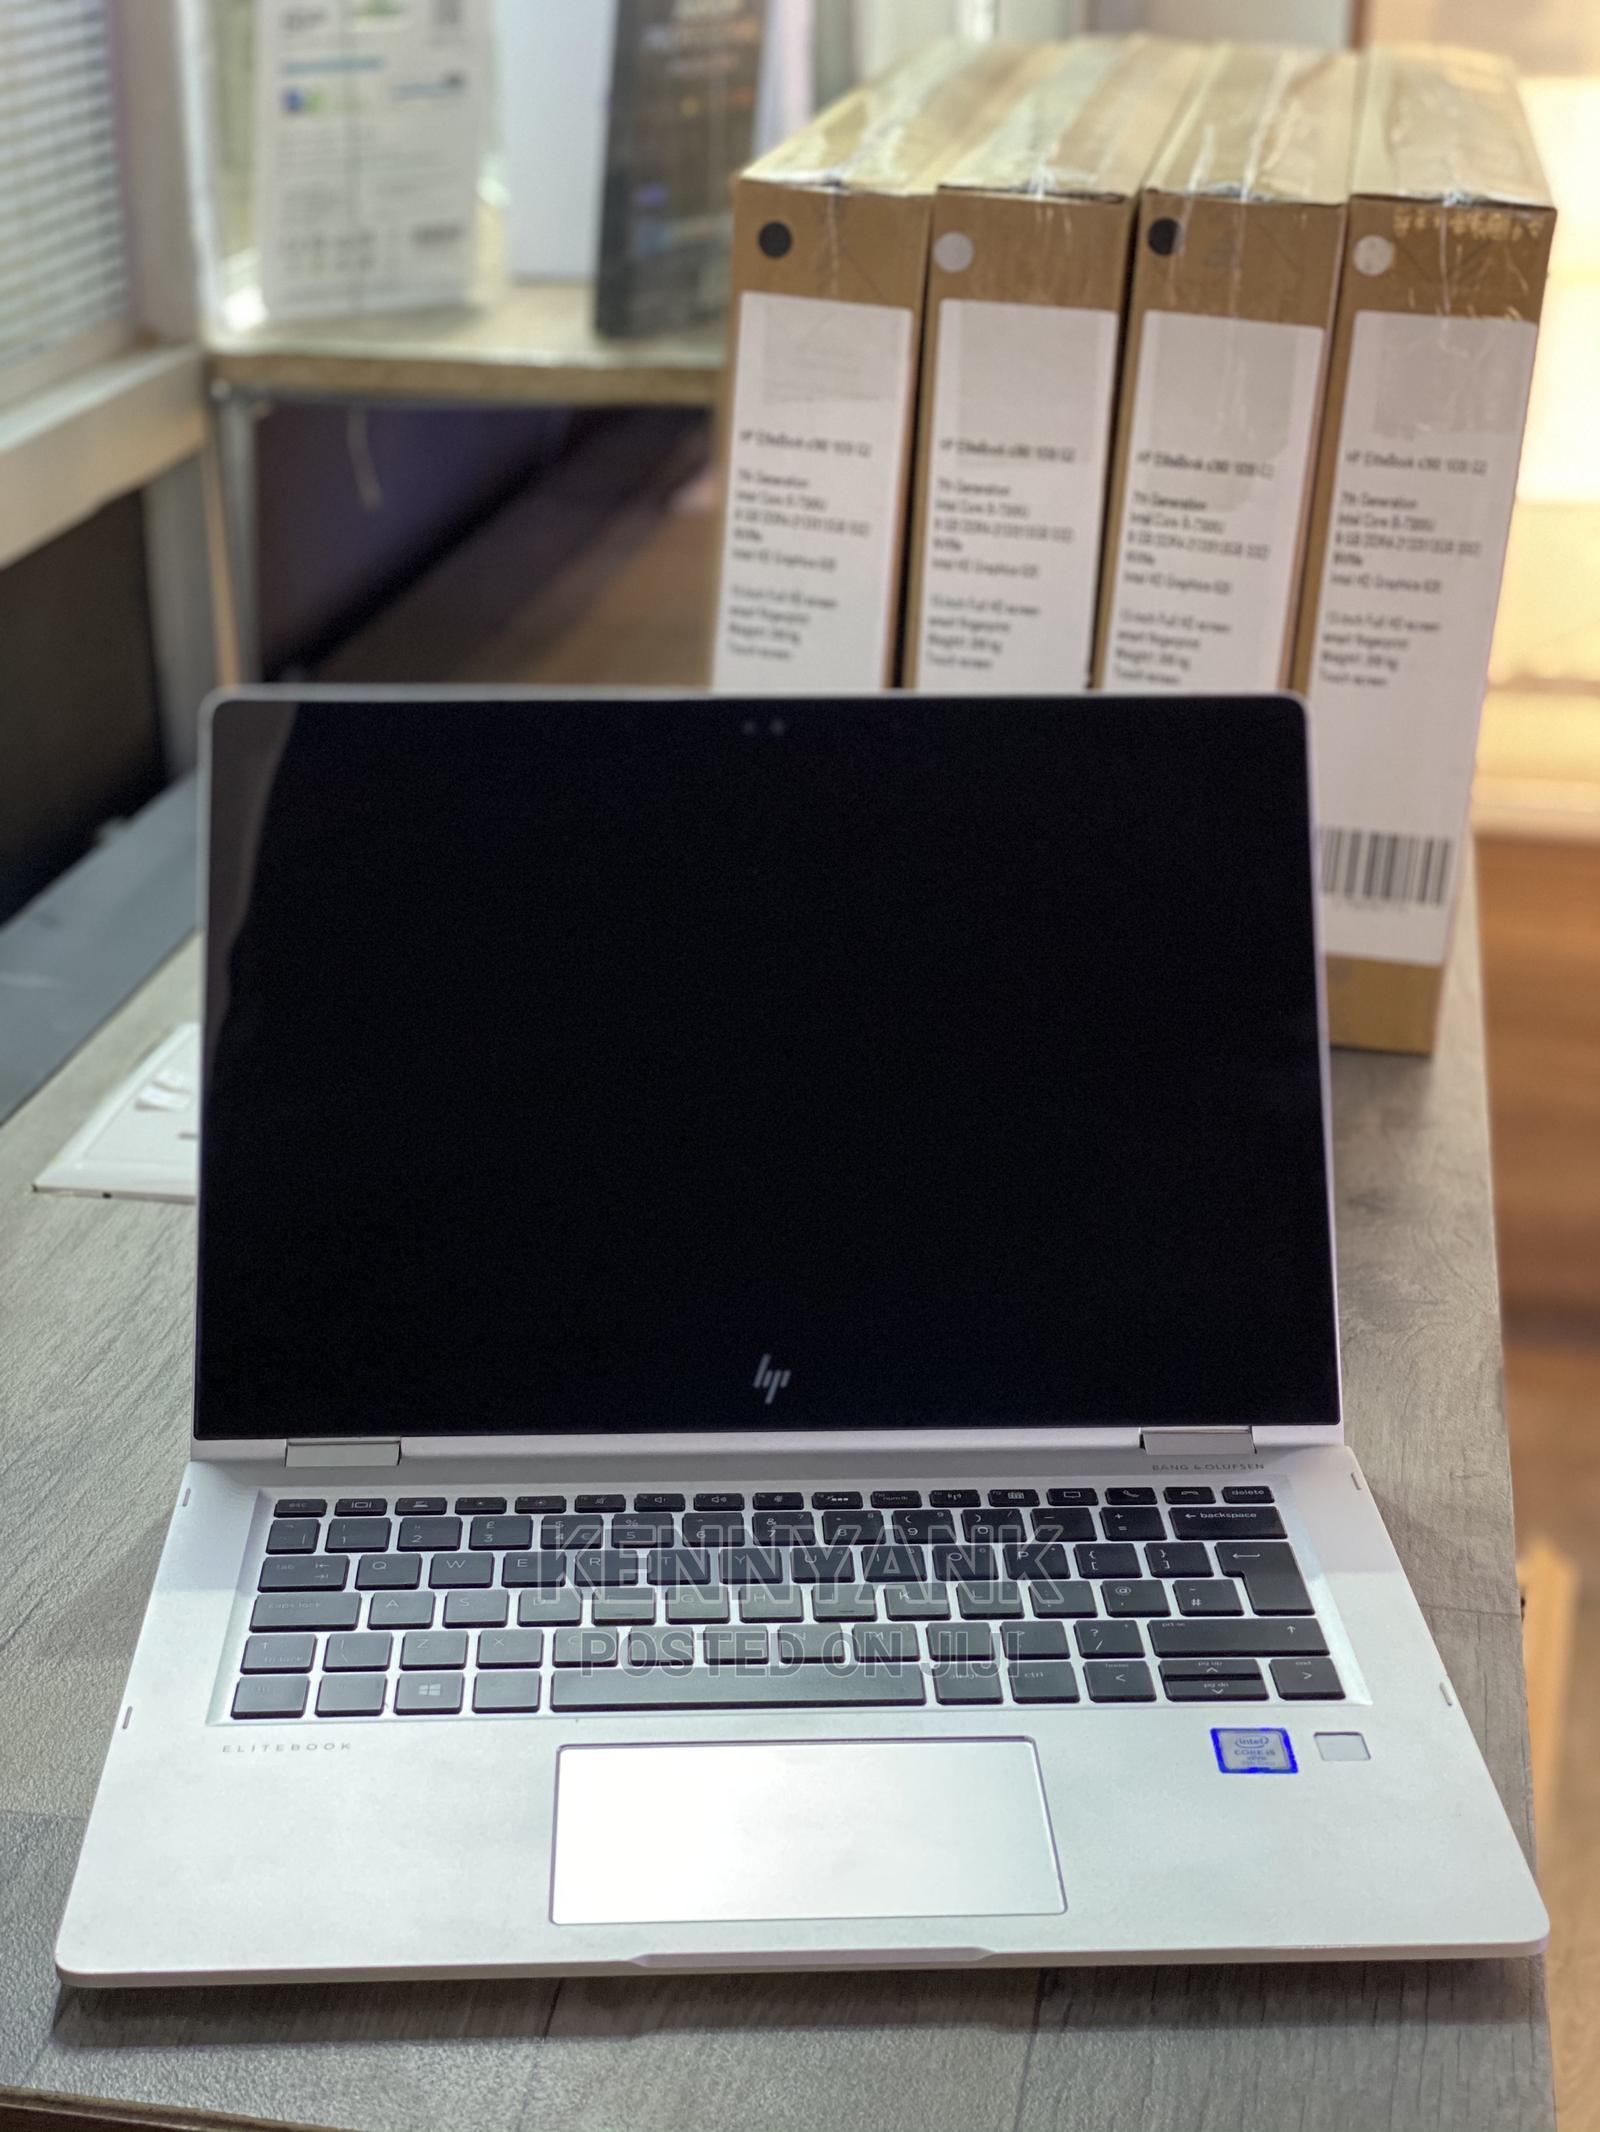 Laptop HP EliteBook X360 1030 G2 8GB Intel Core I7 SSD 512GB | Laptops & Computers for sale in Nairobi Central, Nairobi, Kenya